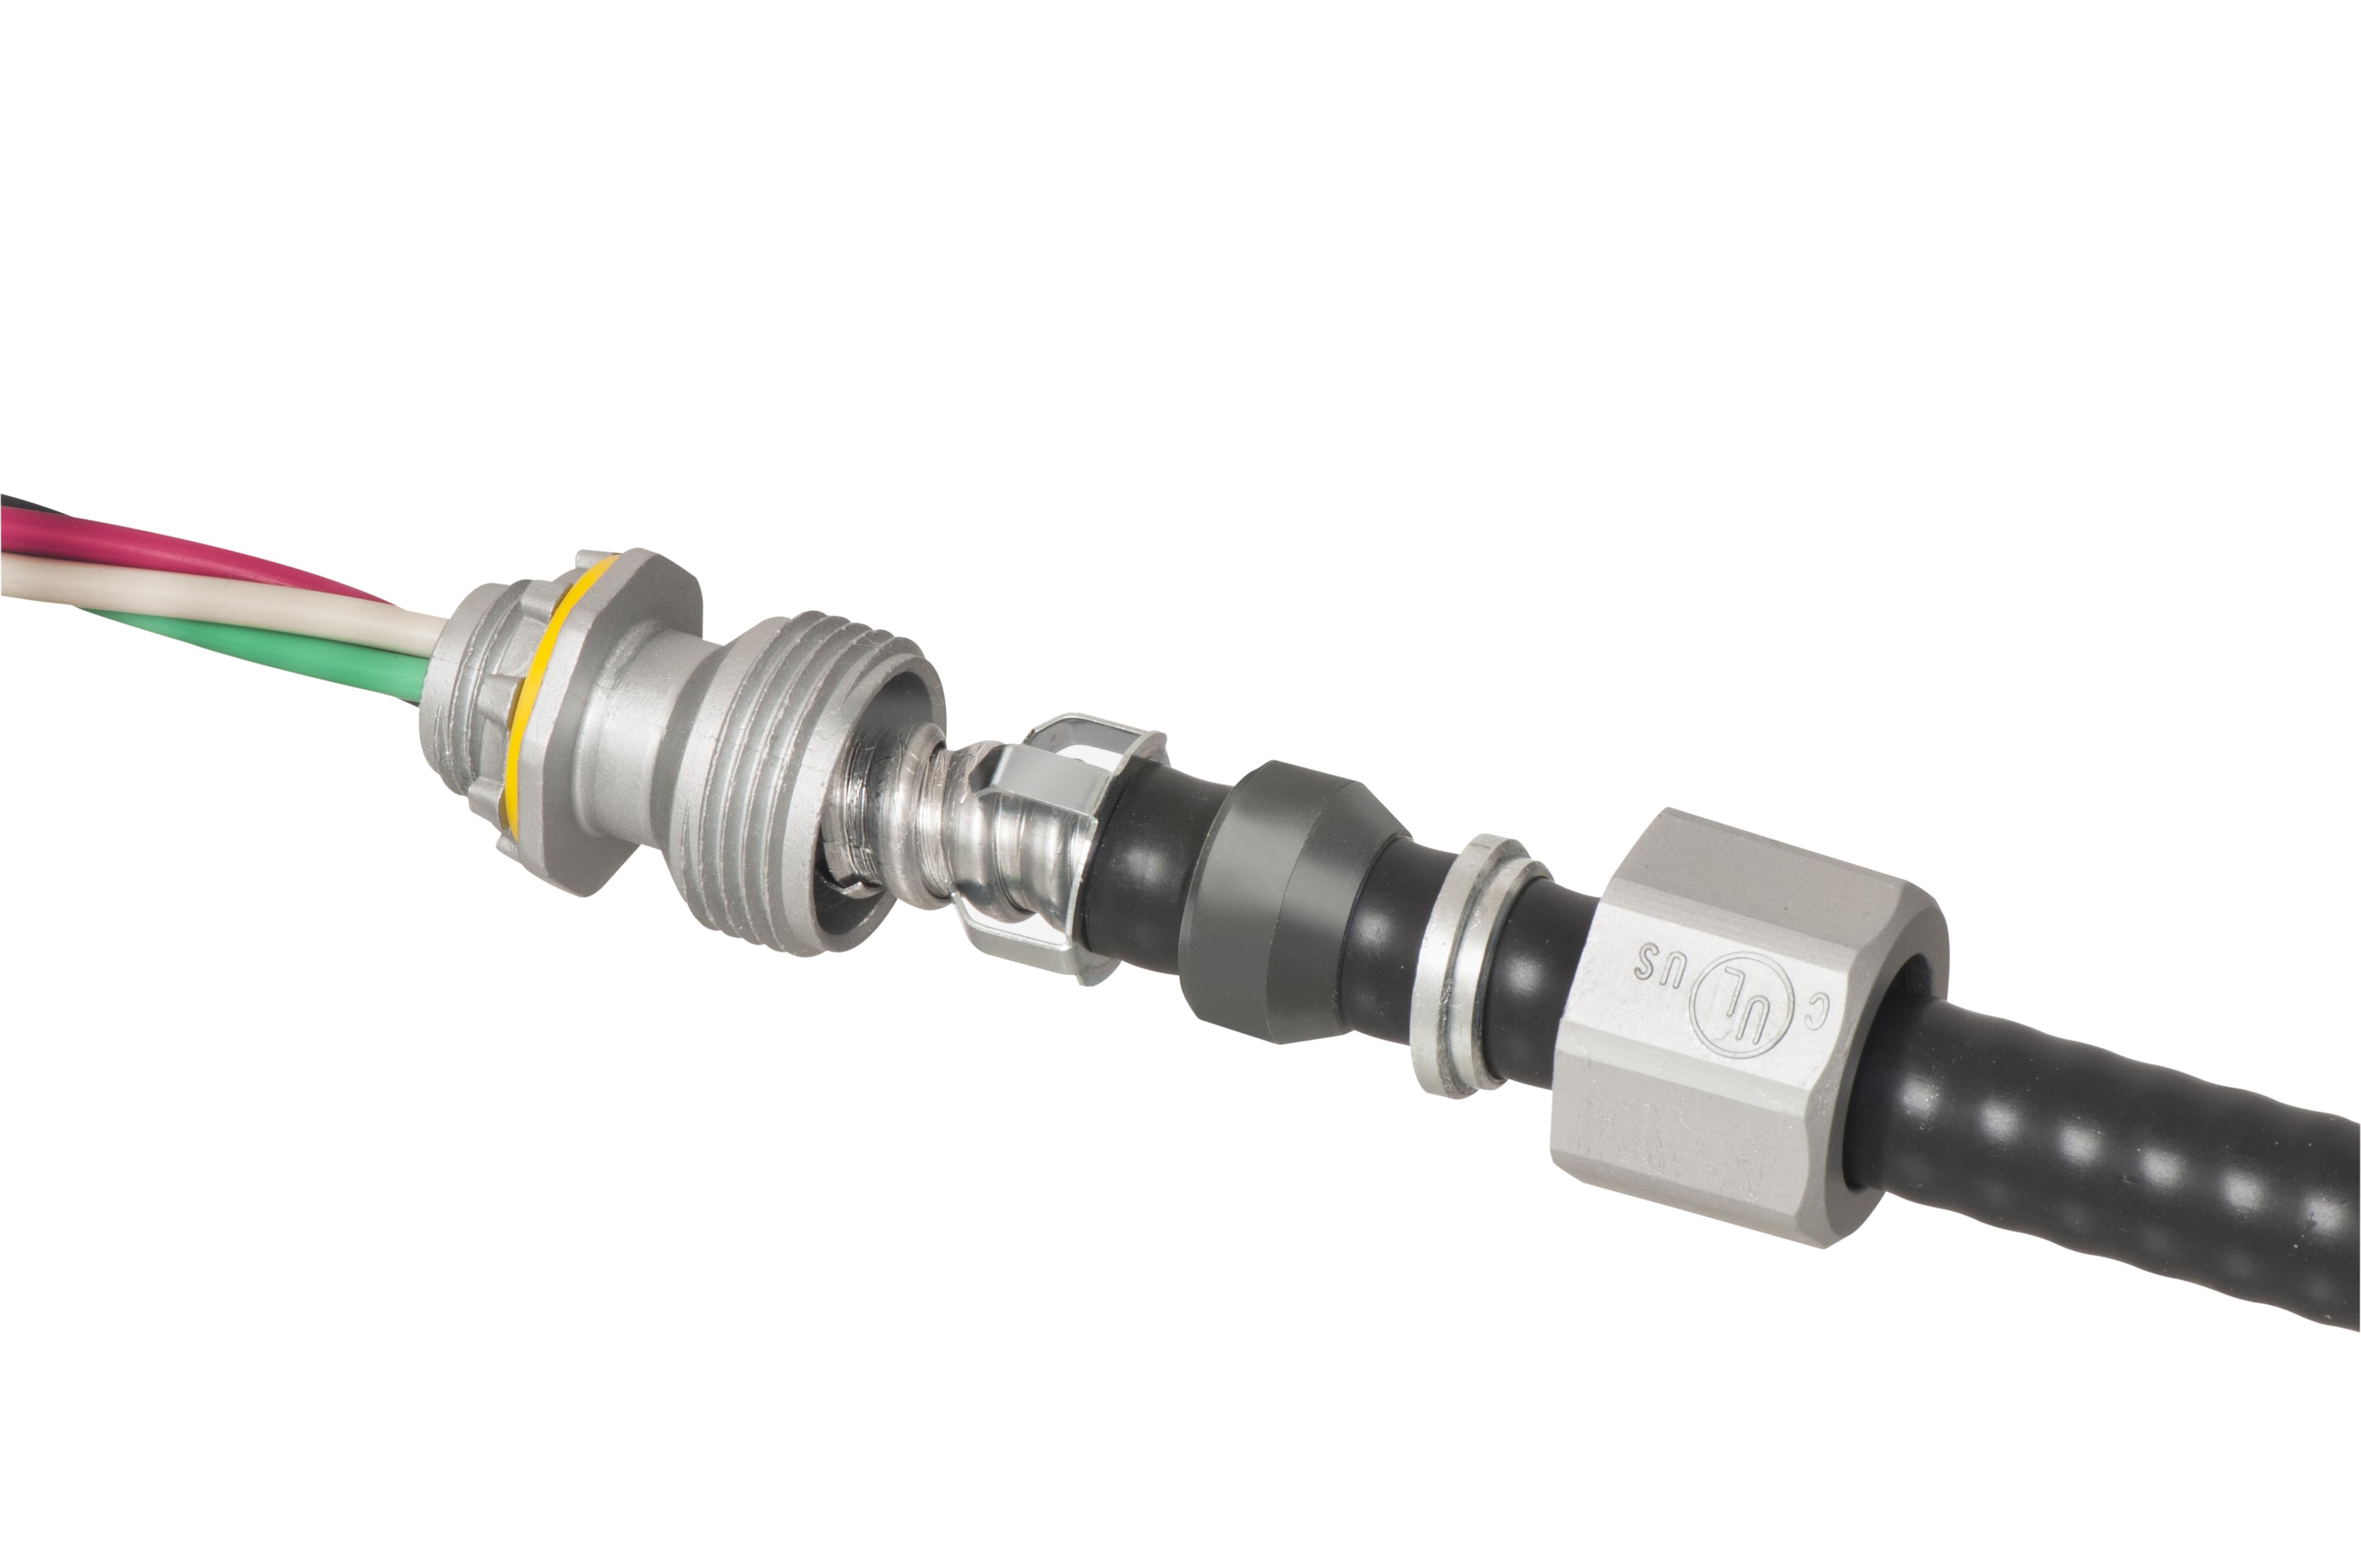 Arlington Ltmc50 Product Information